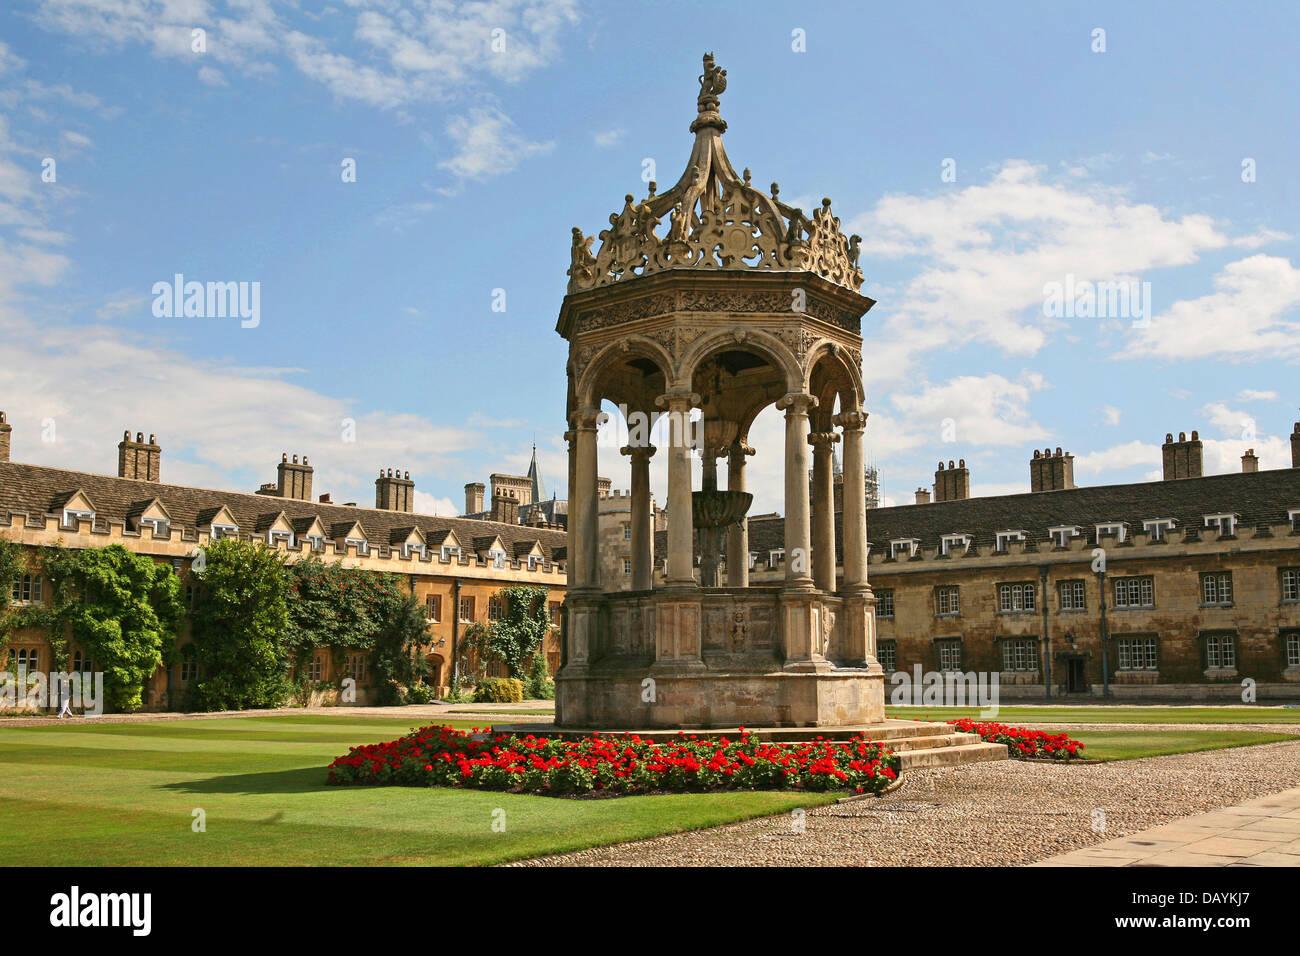 Fountain, Trinity College, Cambridge University, England Stock Photo